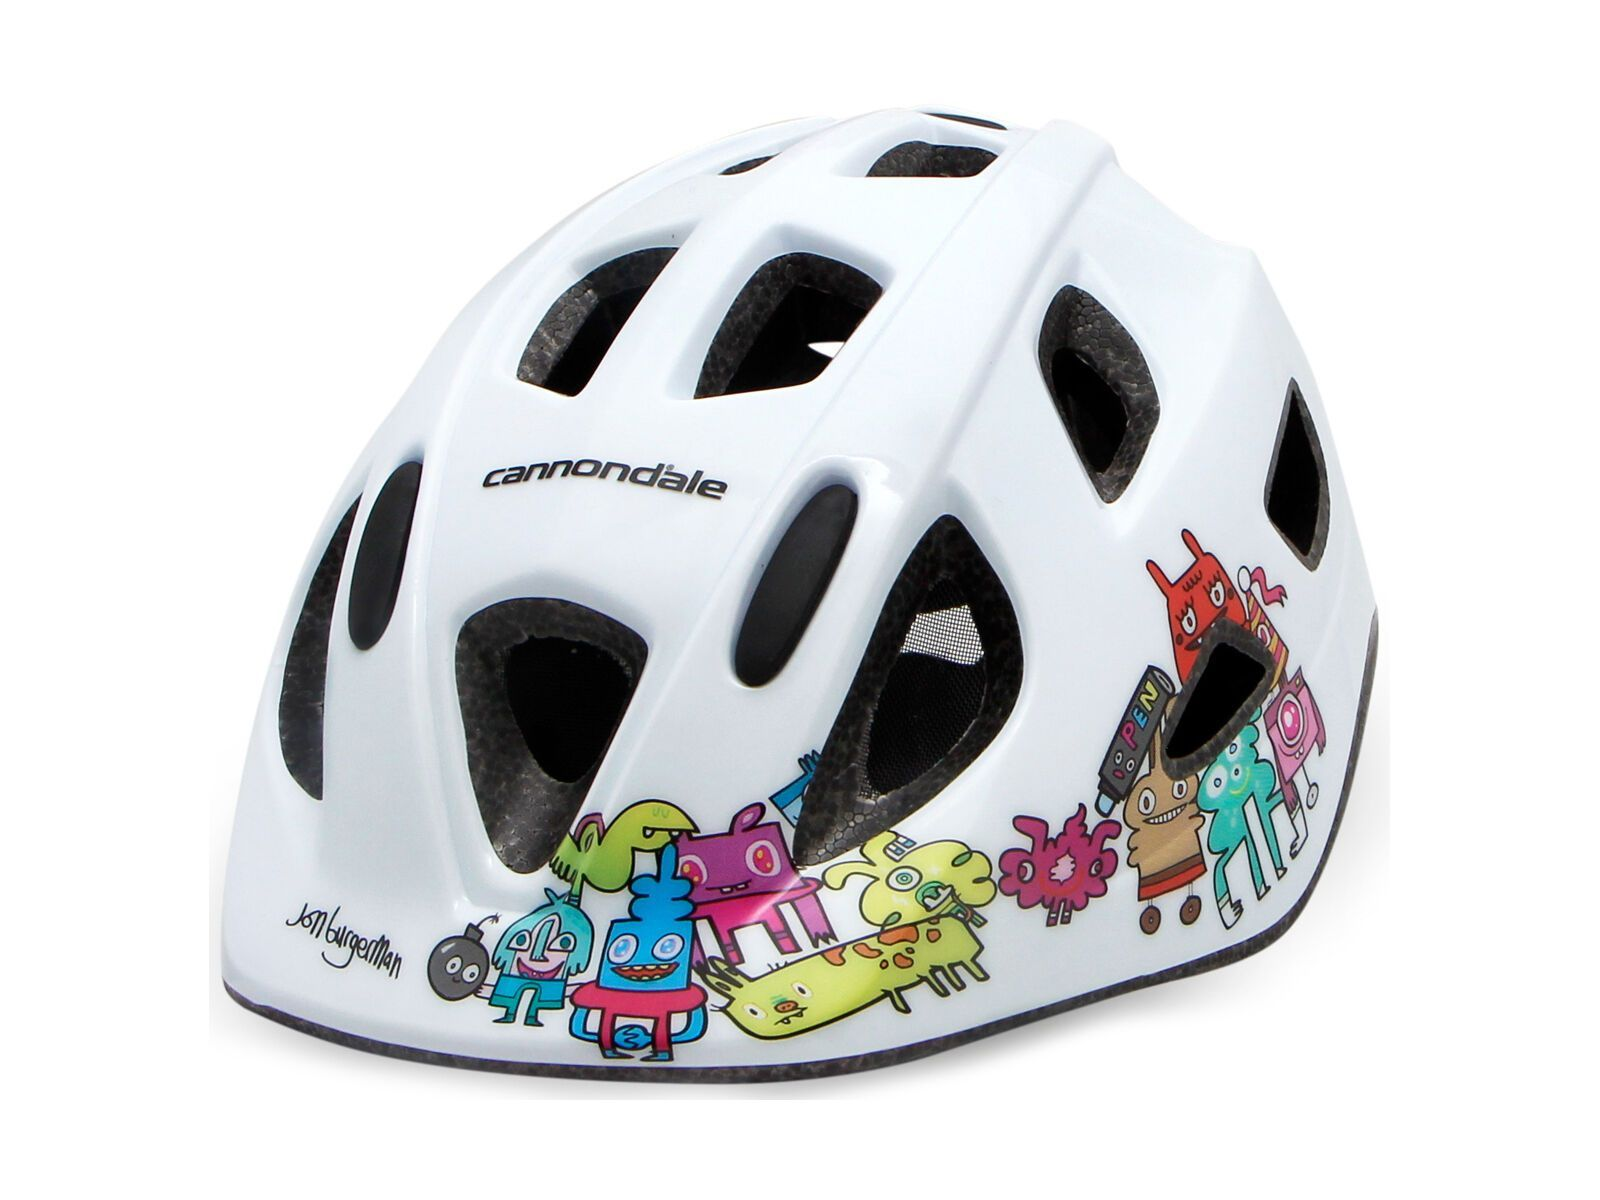 Cannondale Burgerman Colab Kids Helmet, white - Fahrradhelm, Größe S/M // 52-57 CM CH4707U40SM